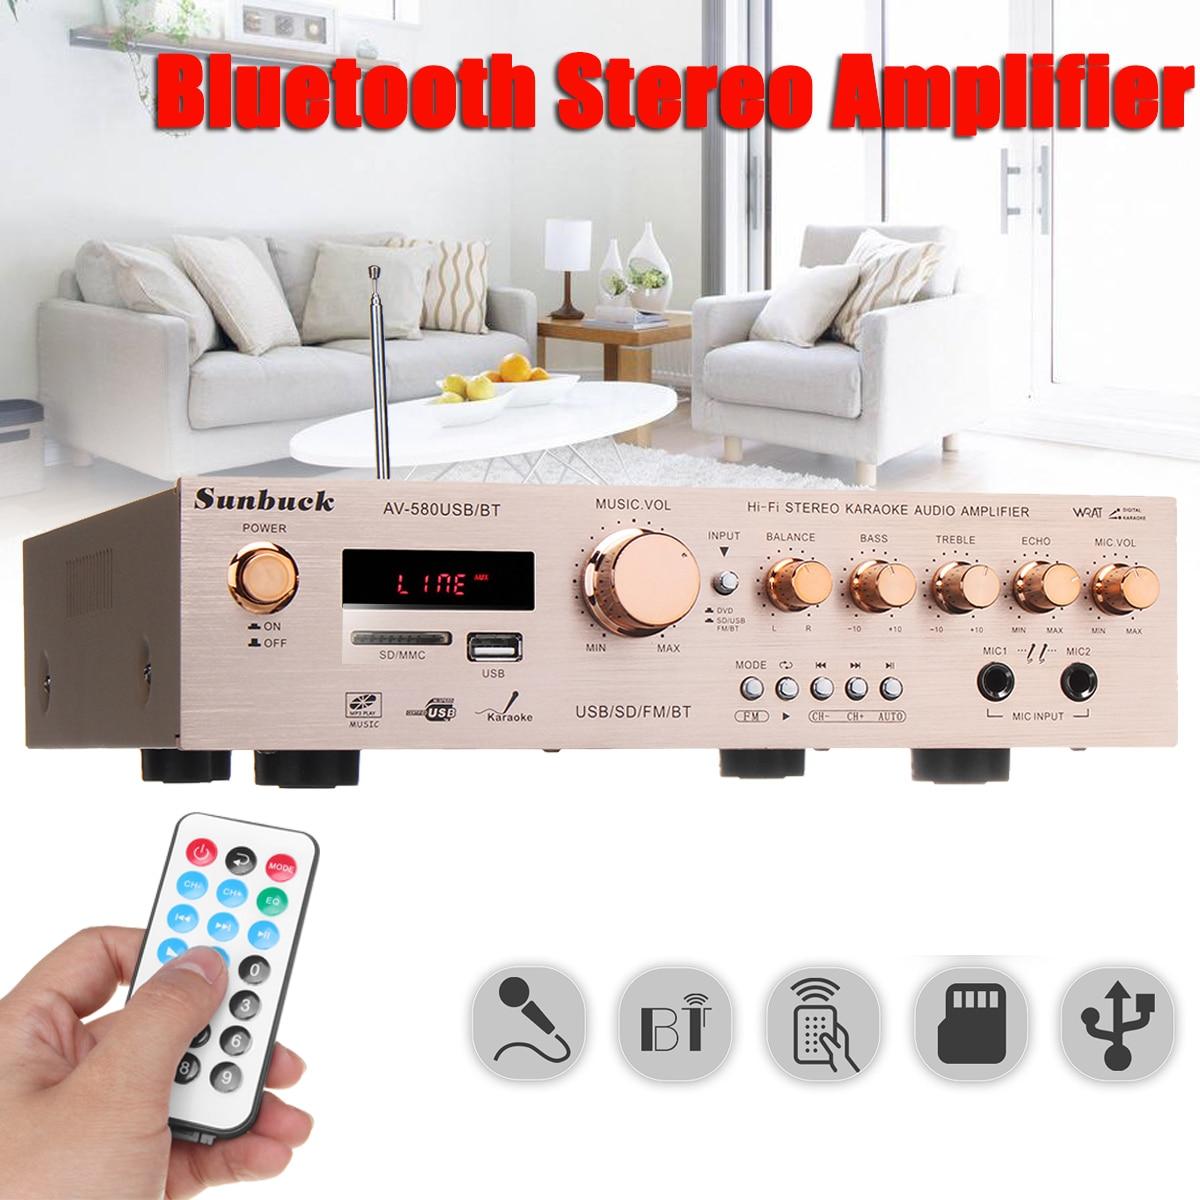 920 w 220 v 5CH Bluetooth HiFi Stereo AV Surround Amplificatore FM Karaoke Home cinema Home Theater Amplificatori